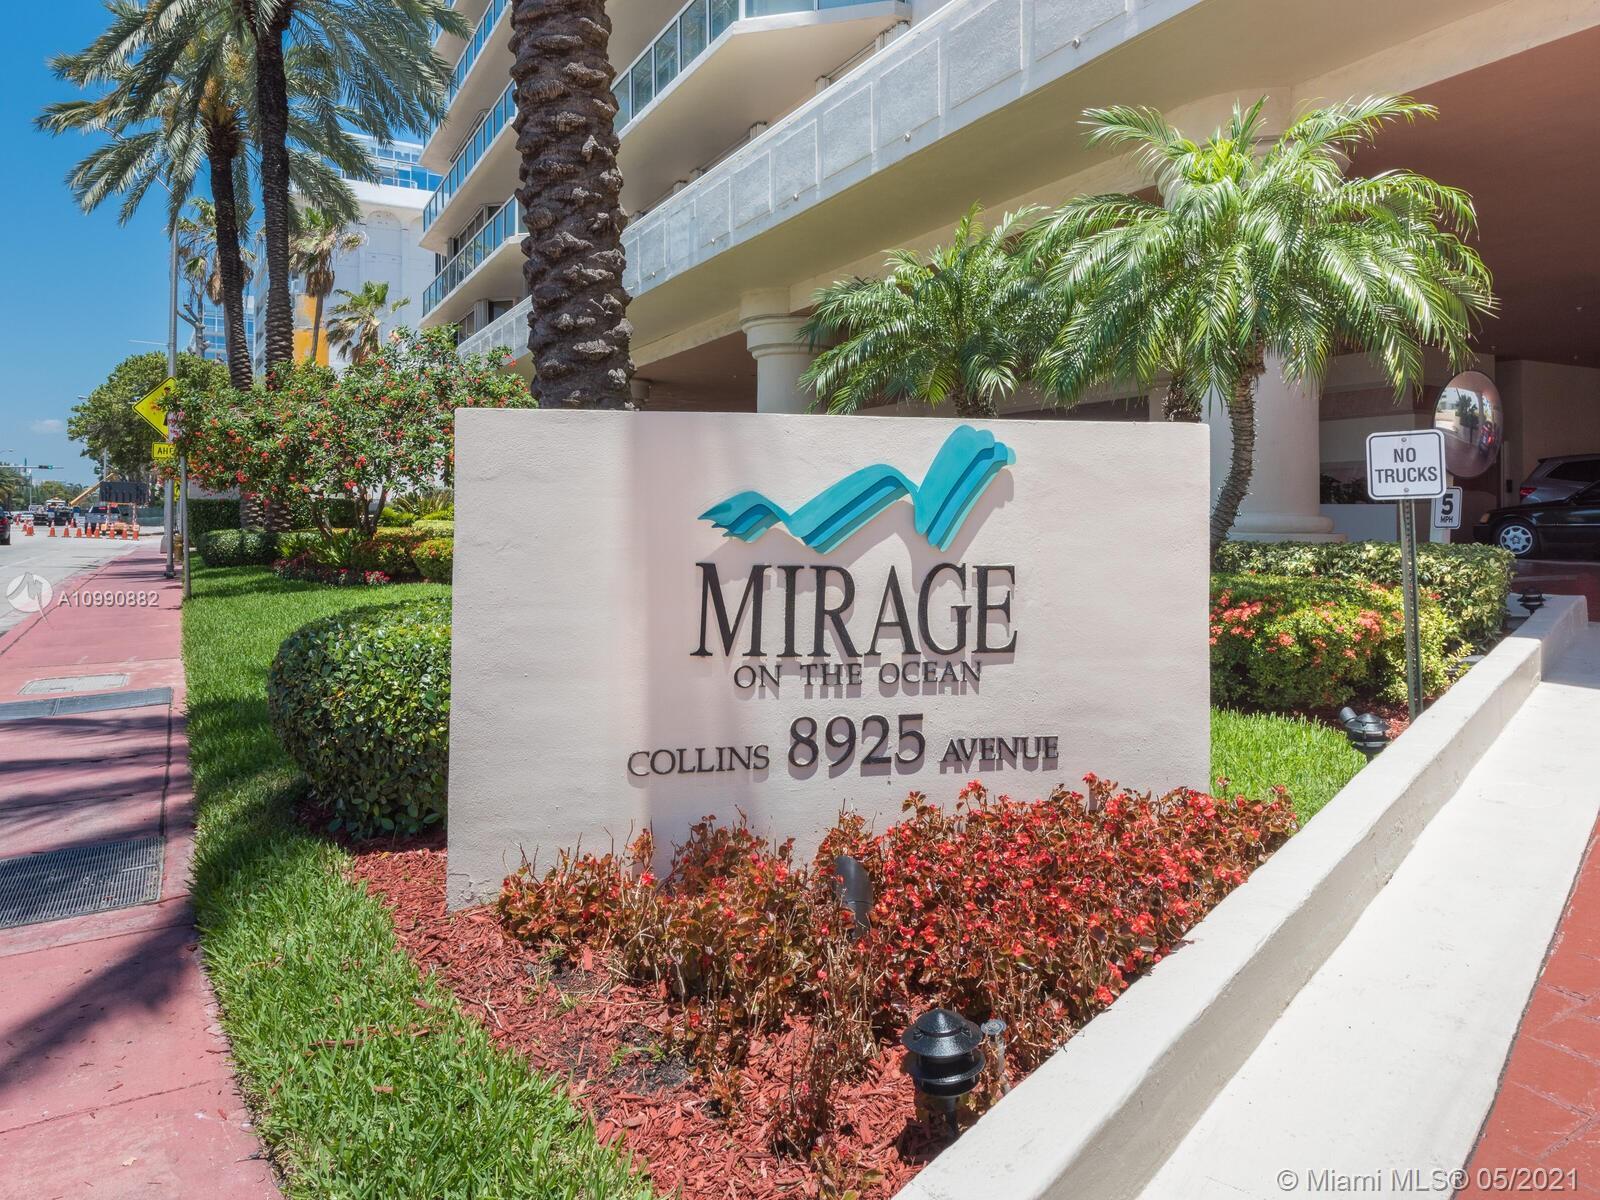 8925 Collins Ave Unit 2 H, Surfside, Florida 33154